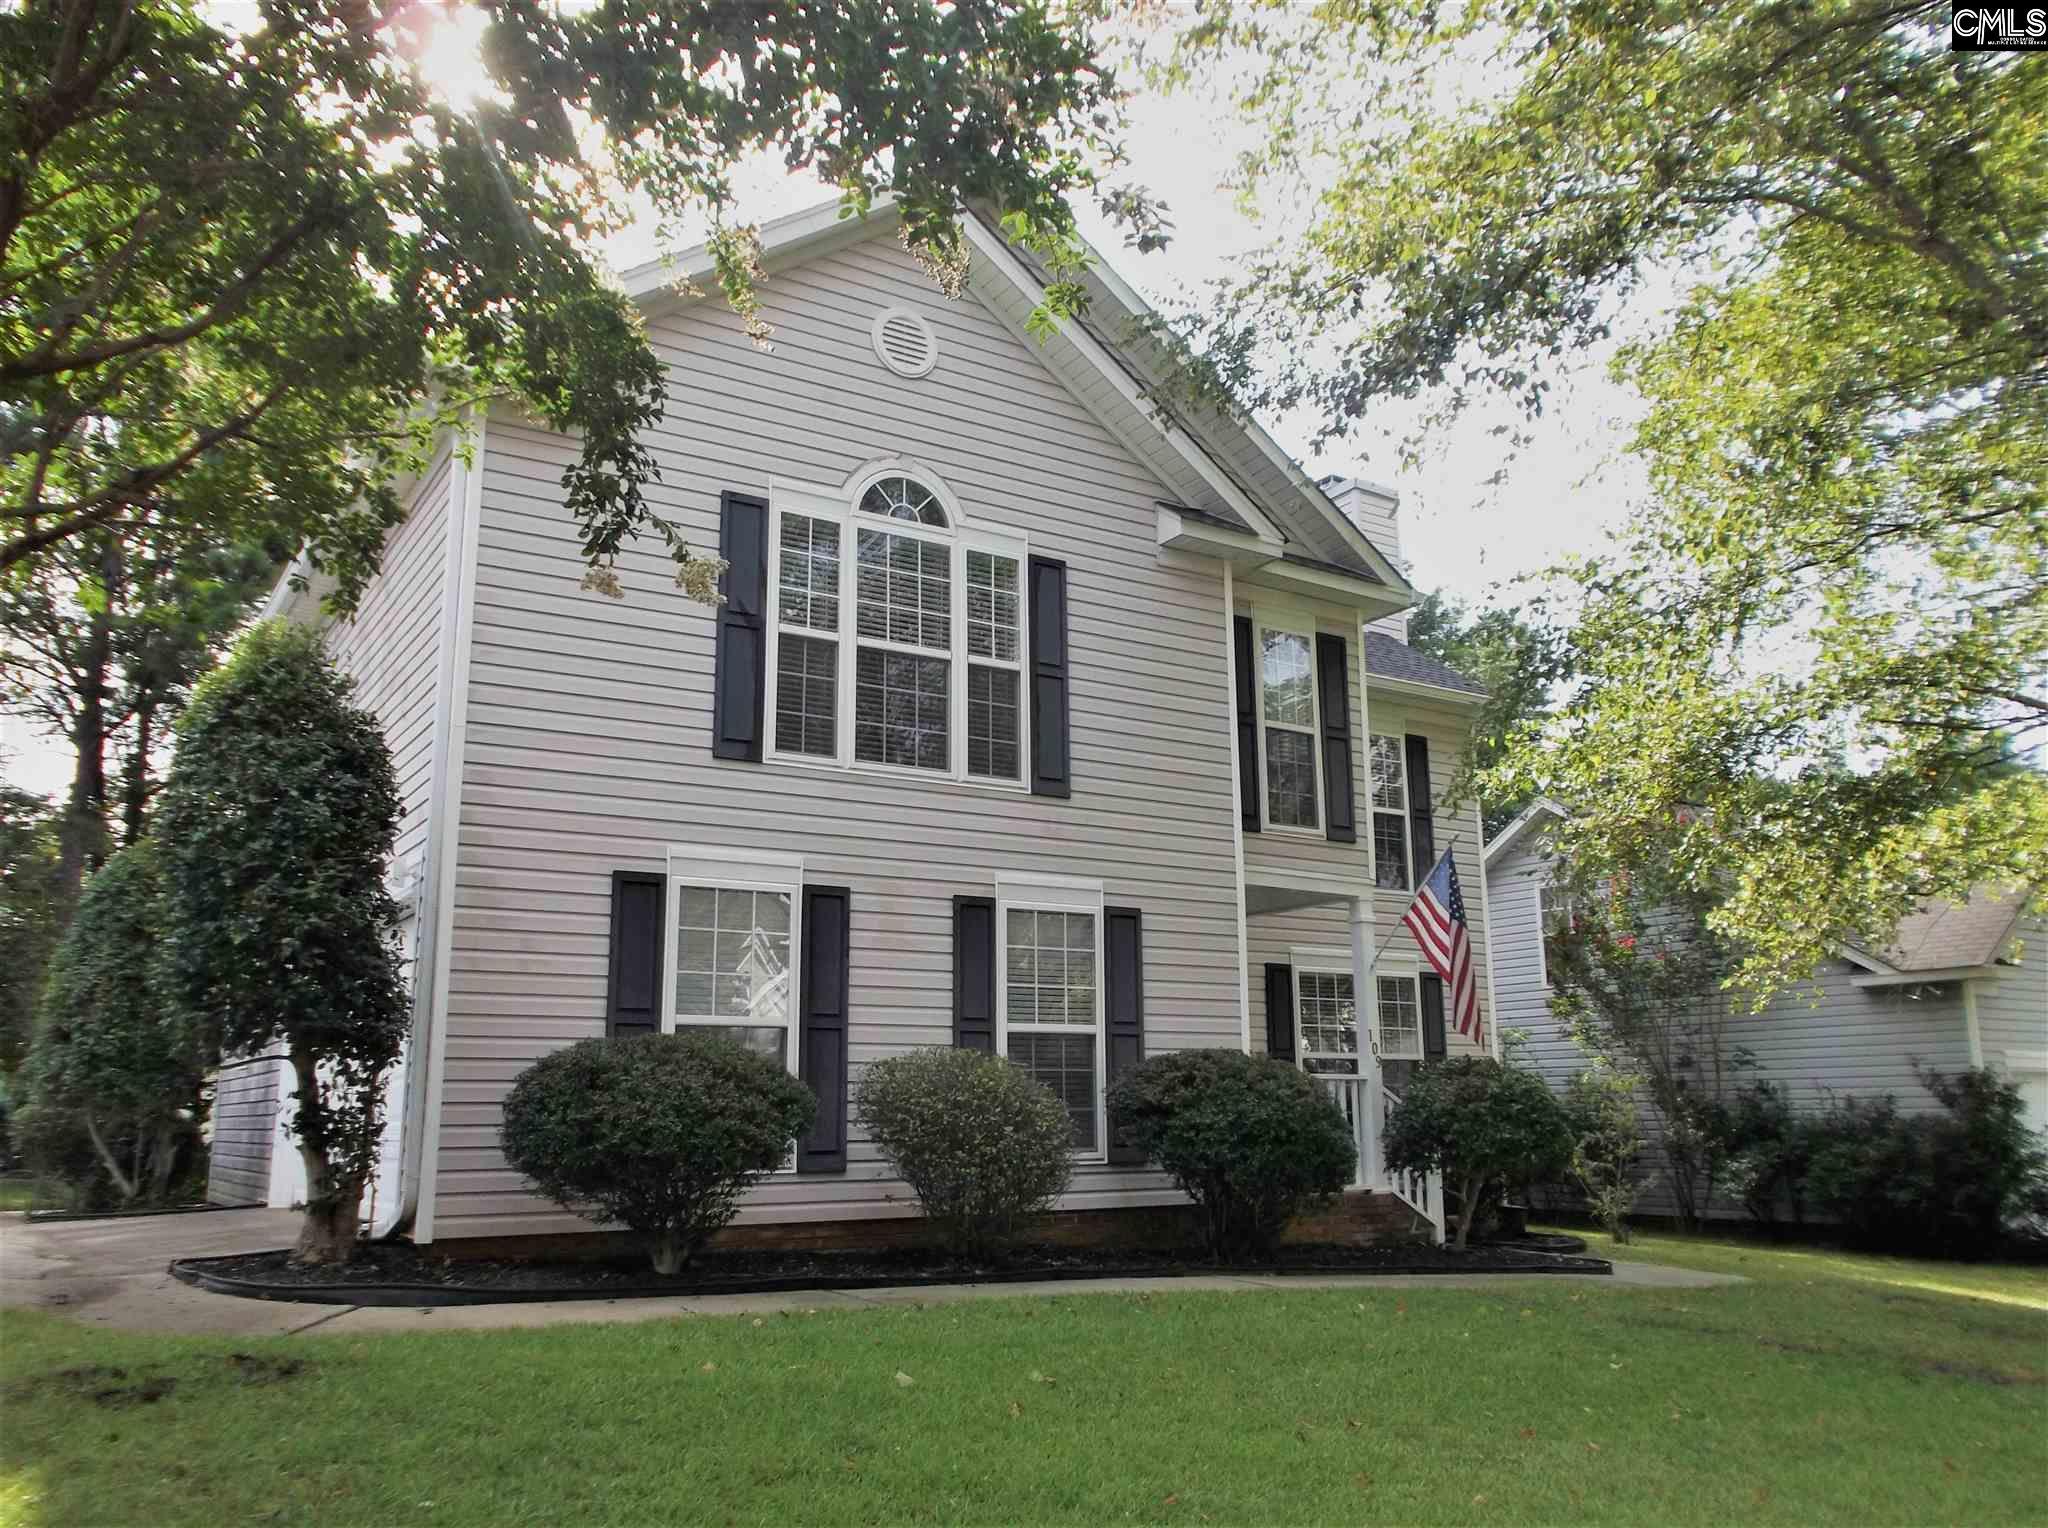 109 Red Barn Lexington, SC 29072